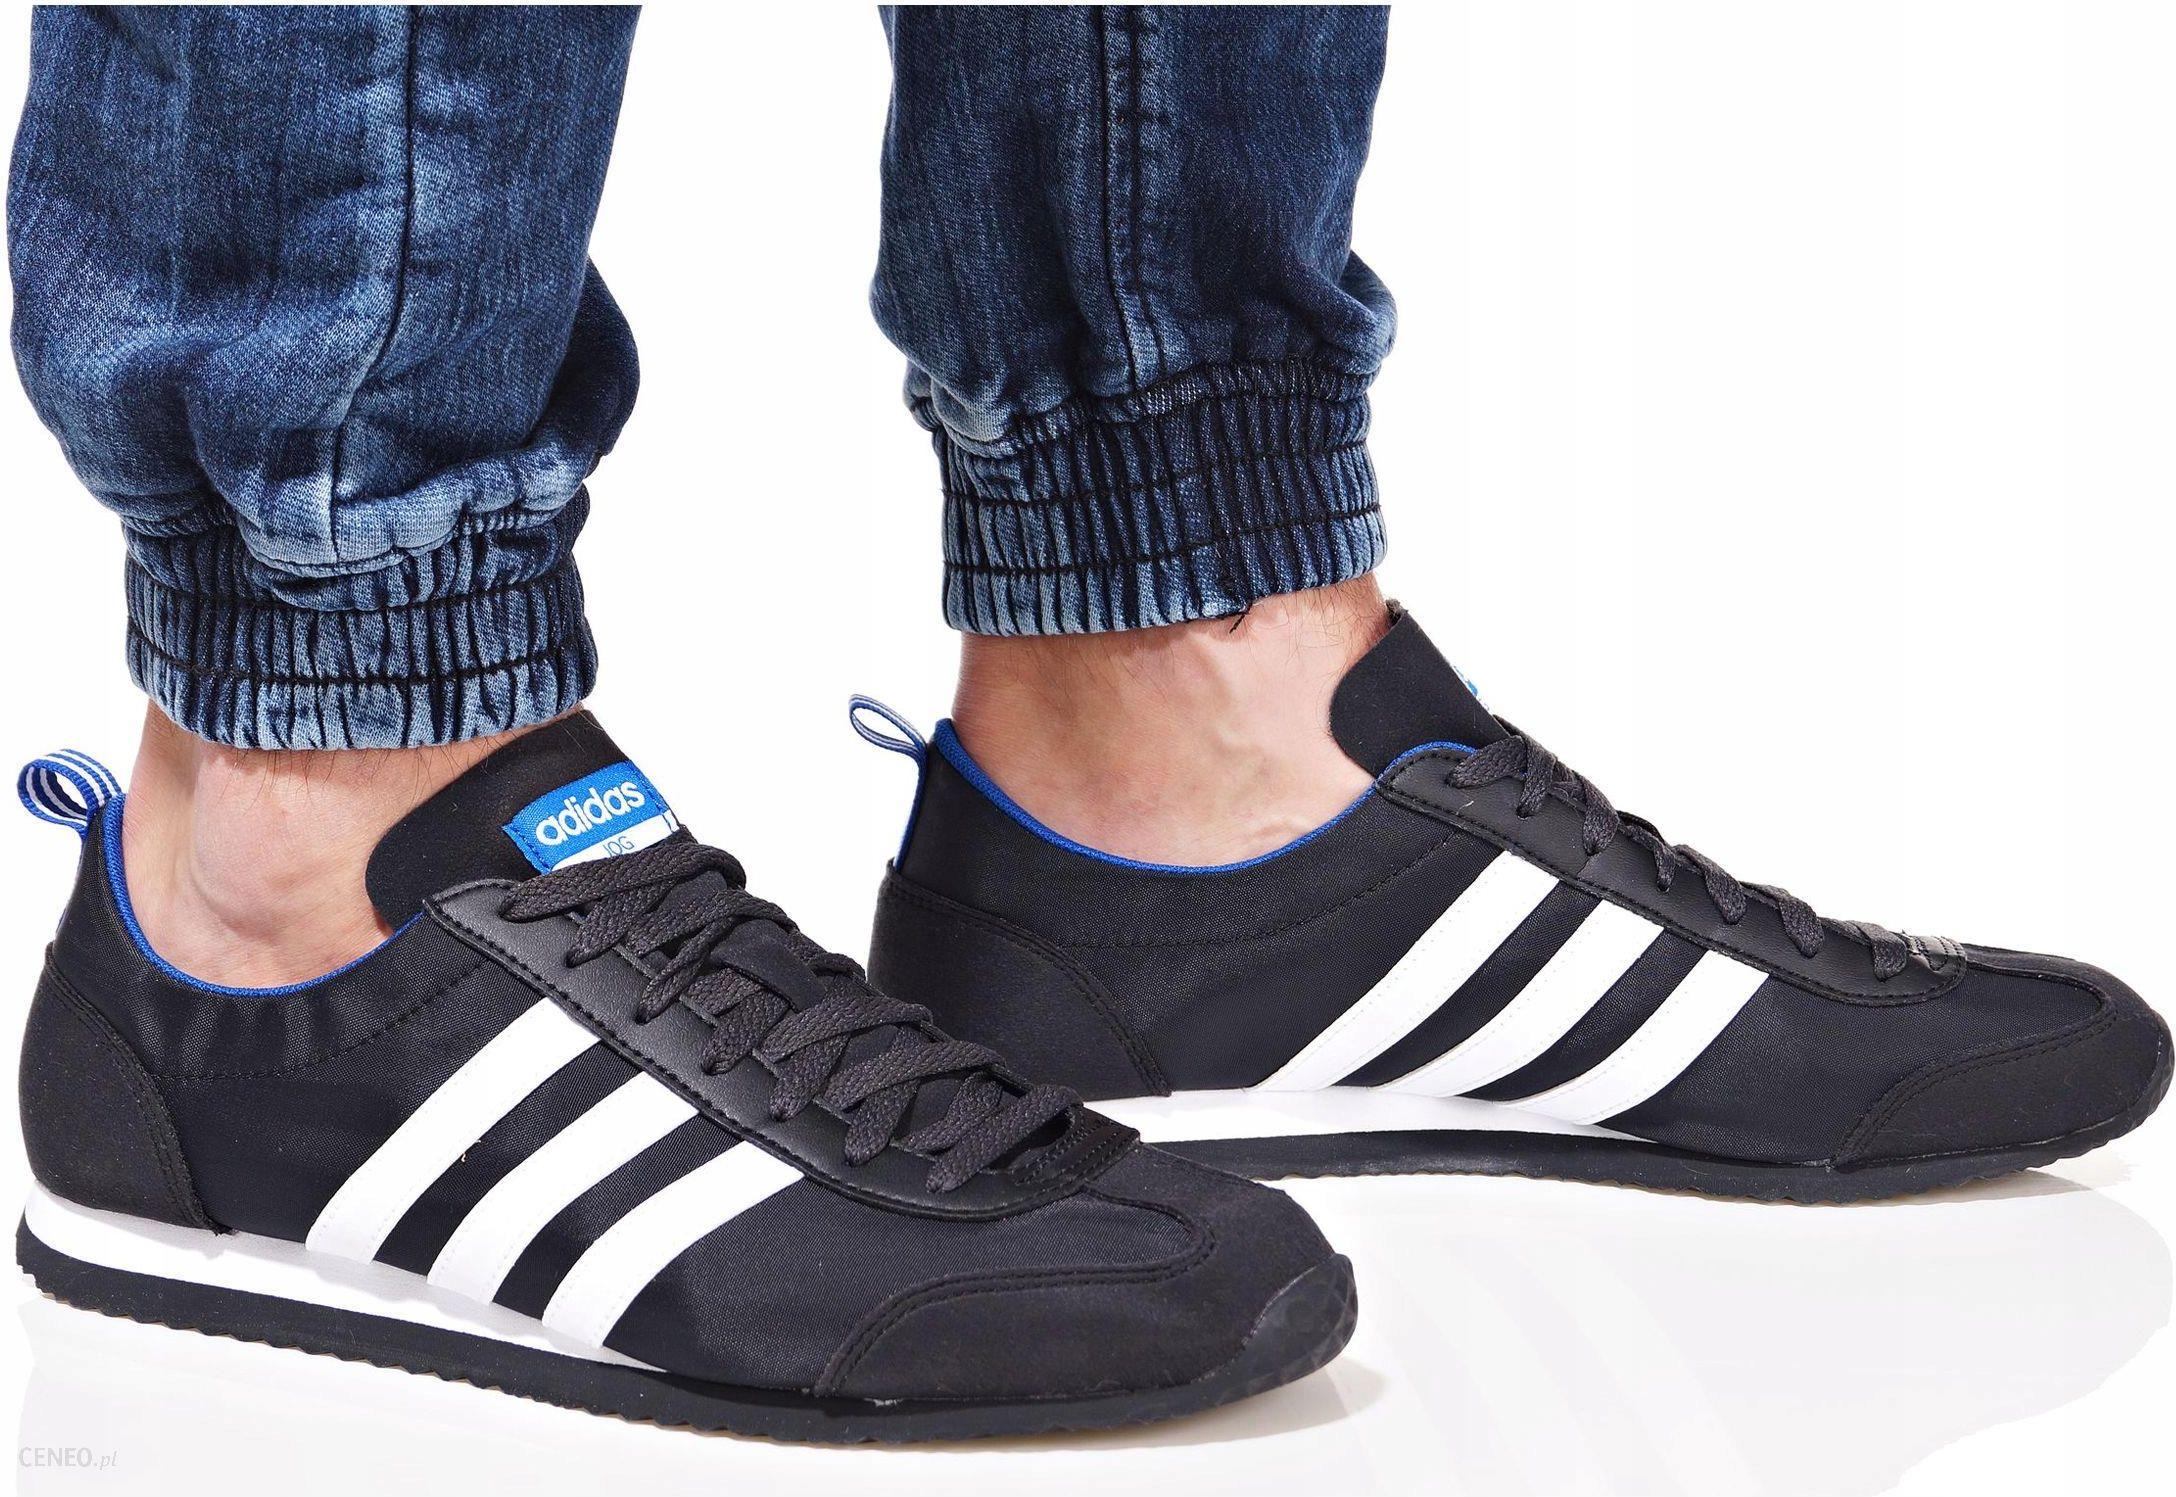 c01e3afcdb3 Buty Adidas Męskie Vs Jog Czarne DB0462 R. 42 2 3 - Ceny i opinie ...